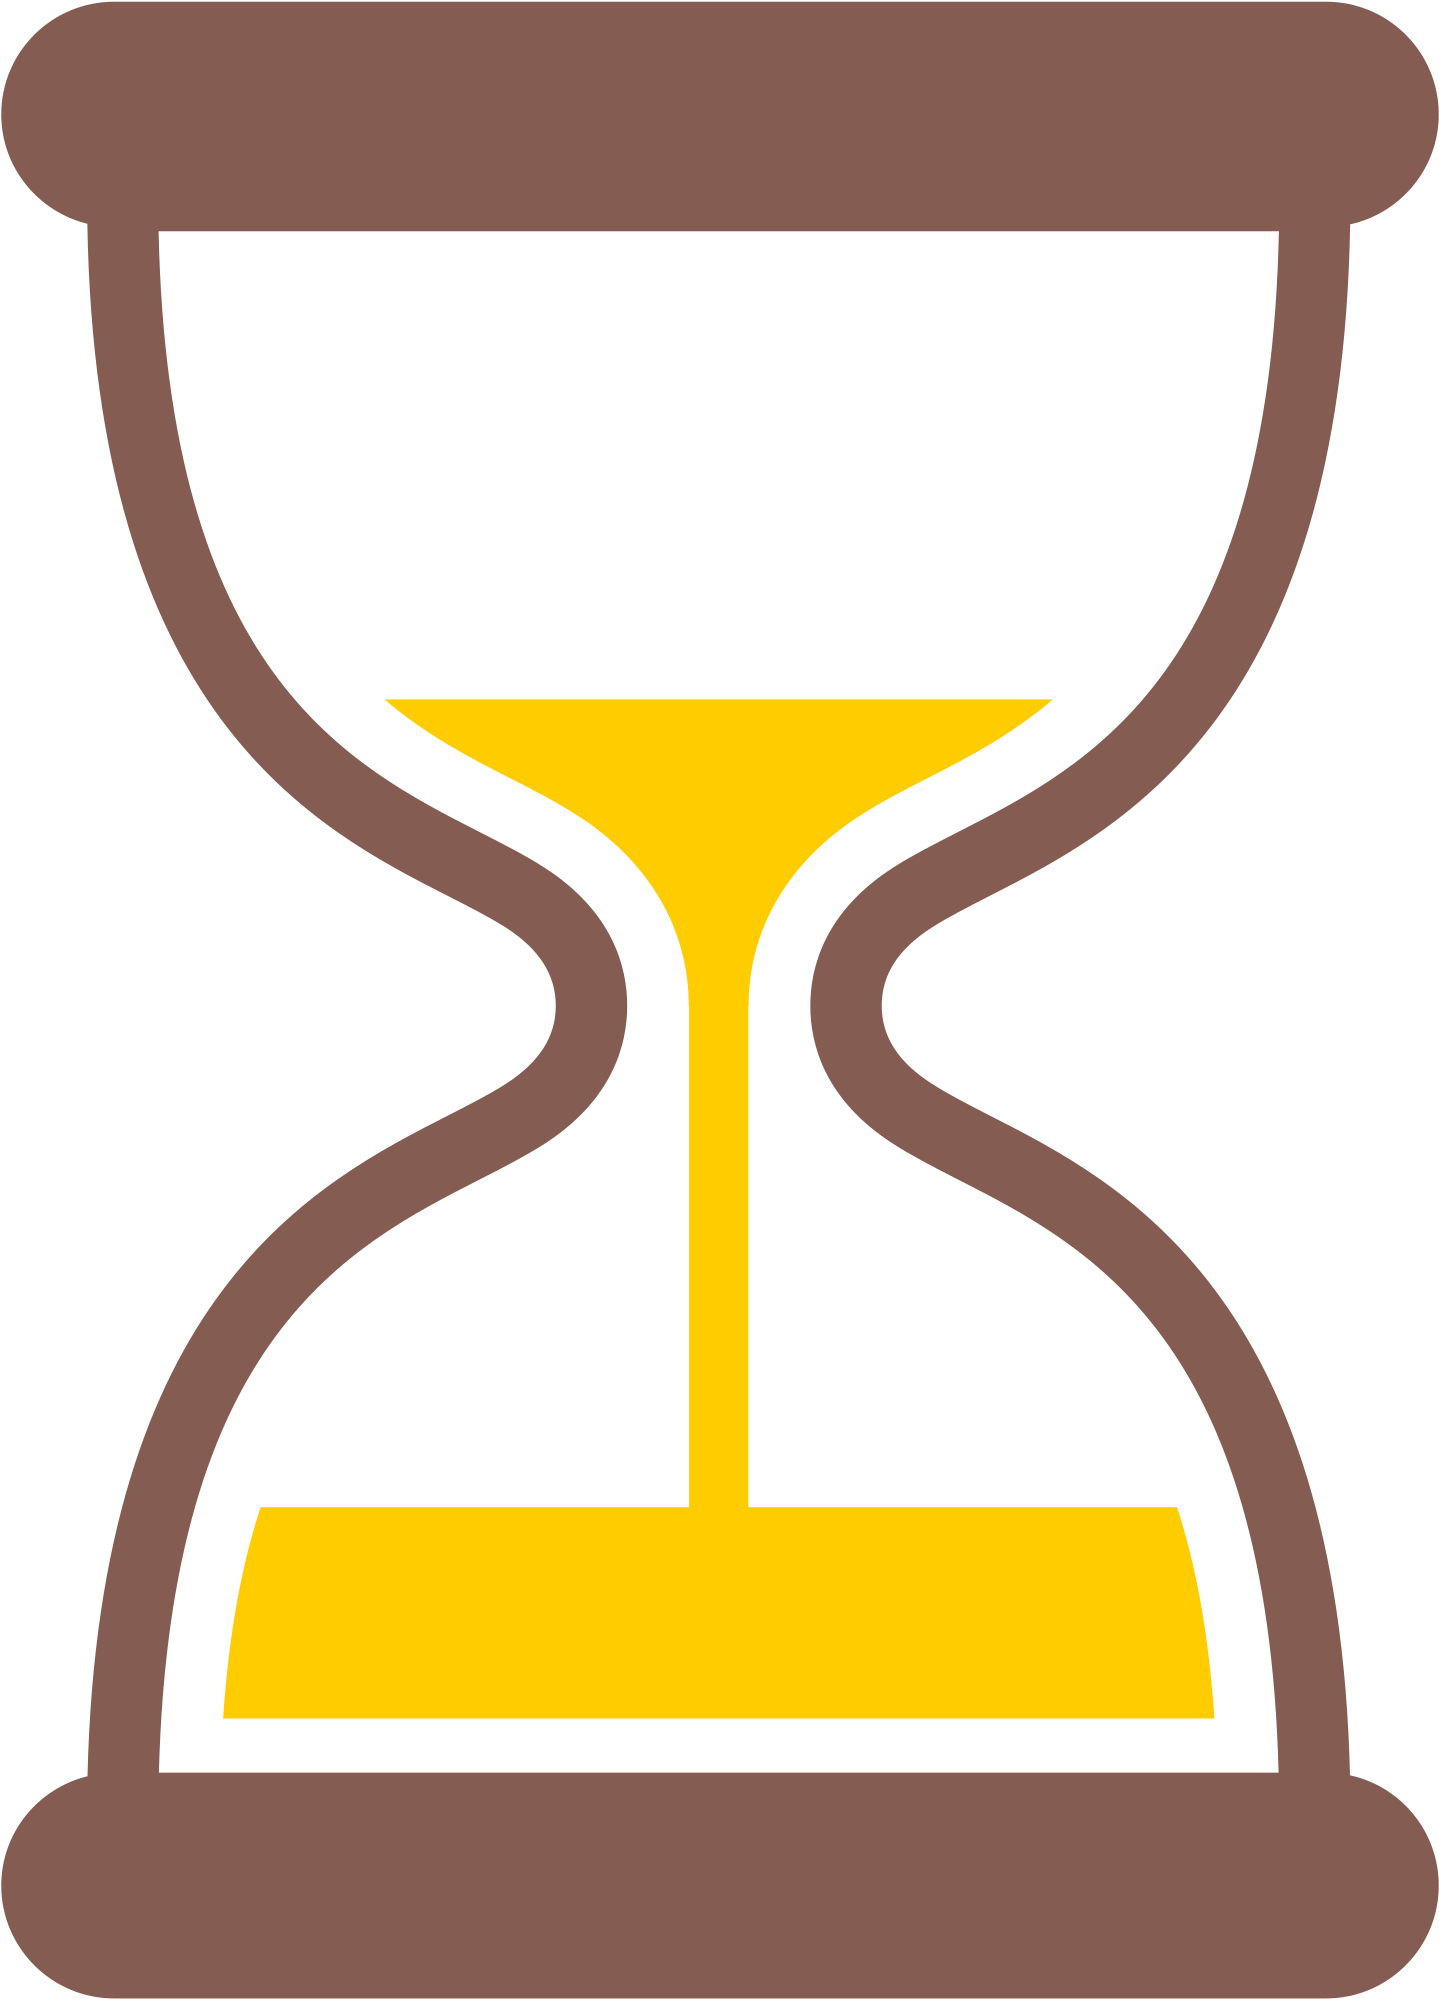 Yellow timer emoji png. Hourglass clipart sand clock